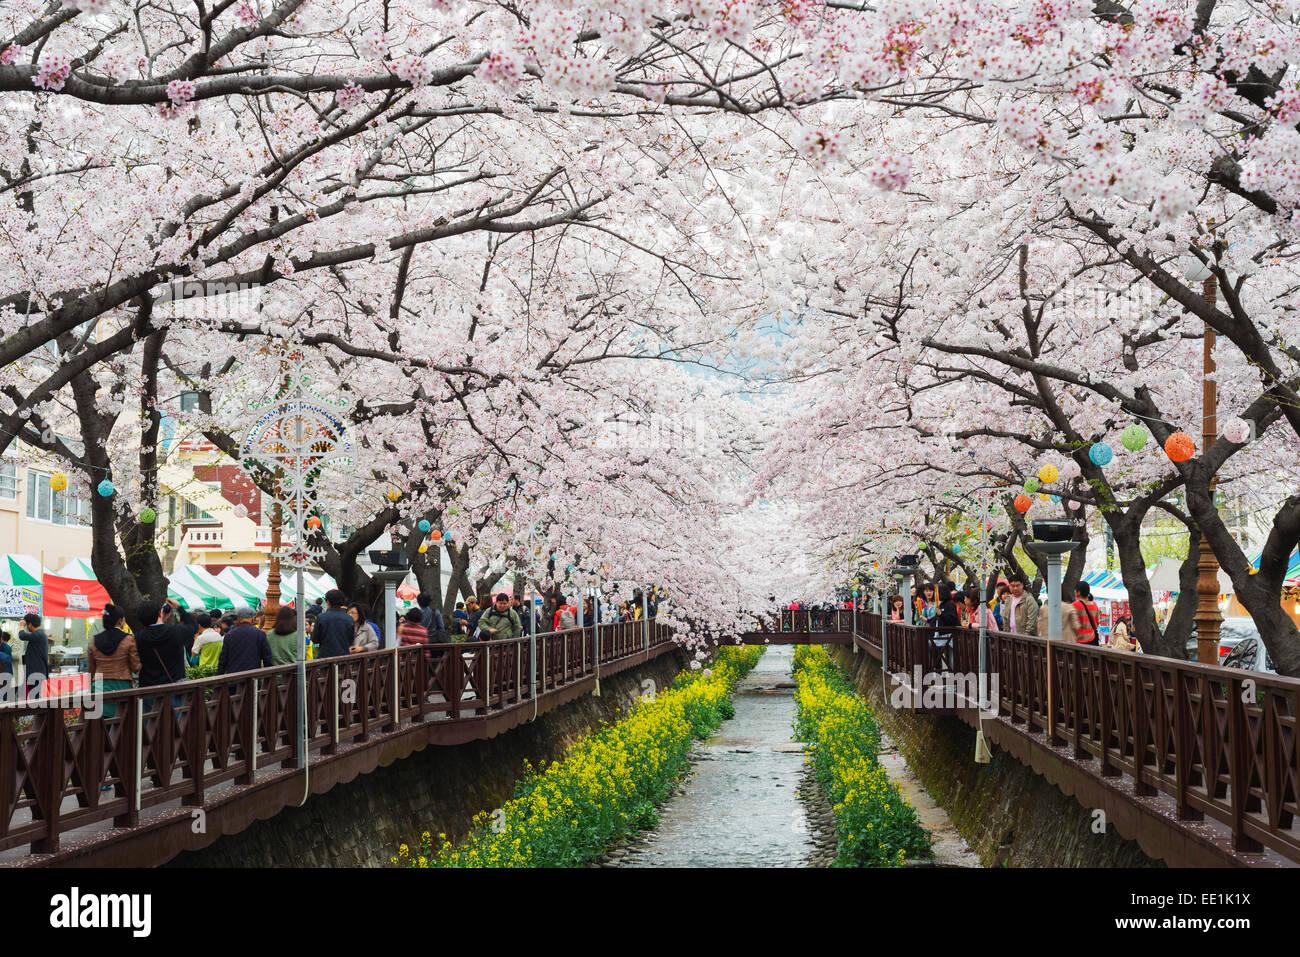 Spring cherry blossom festival, Jinhei, Corée du Sud, Asie Photo Stock